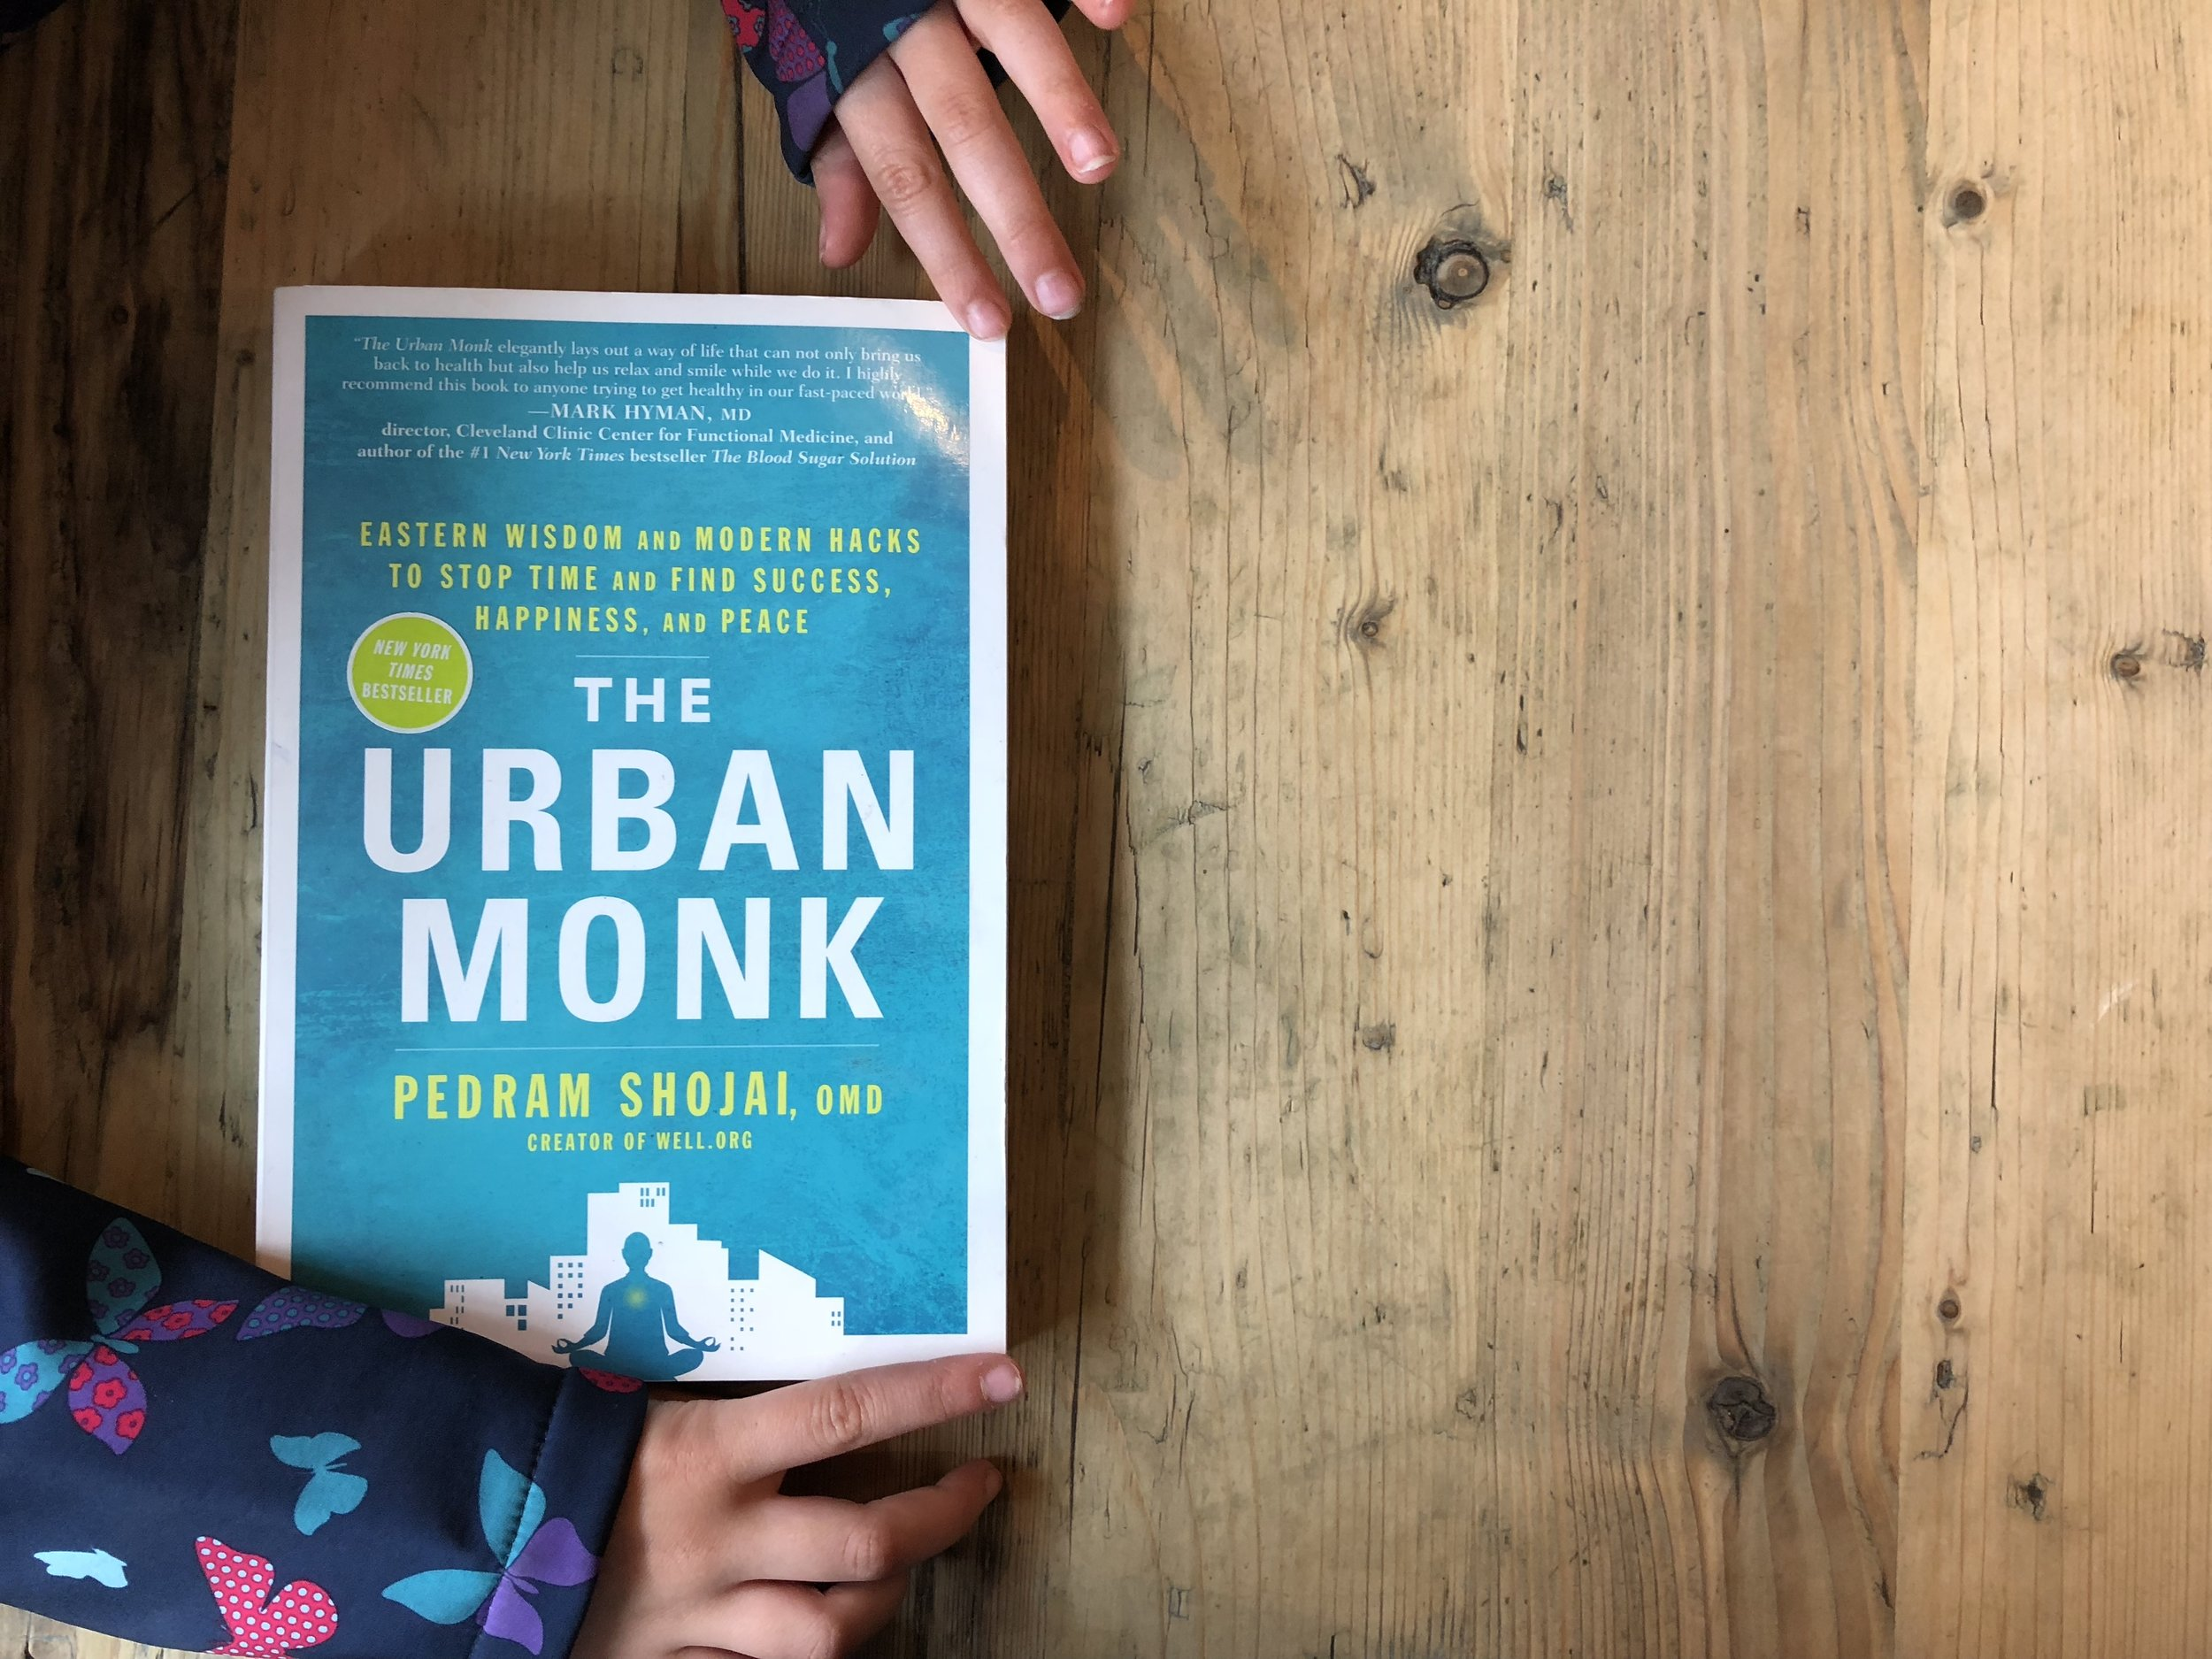 THE URBAN MONK - By Pedram Shojai